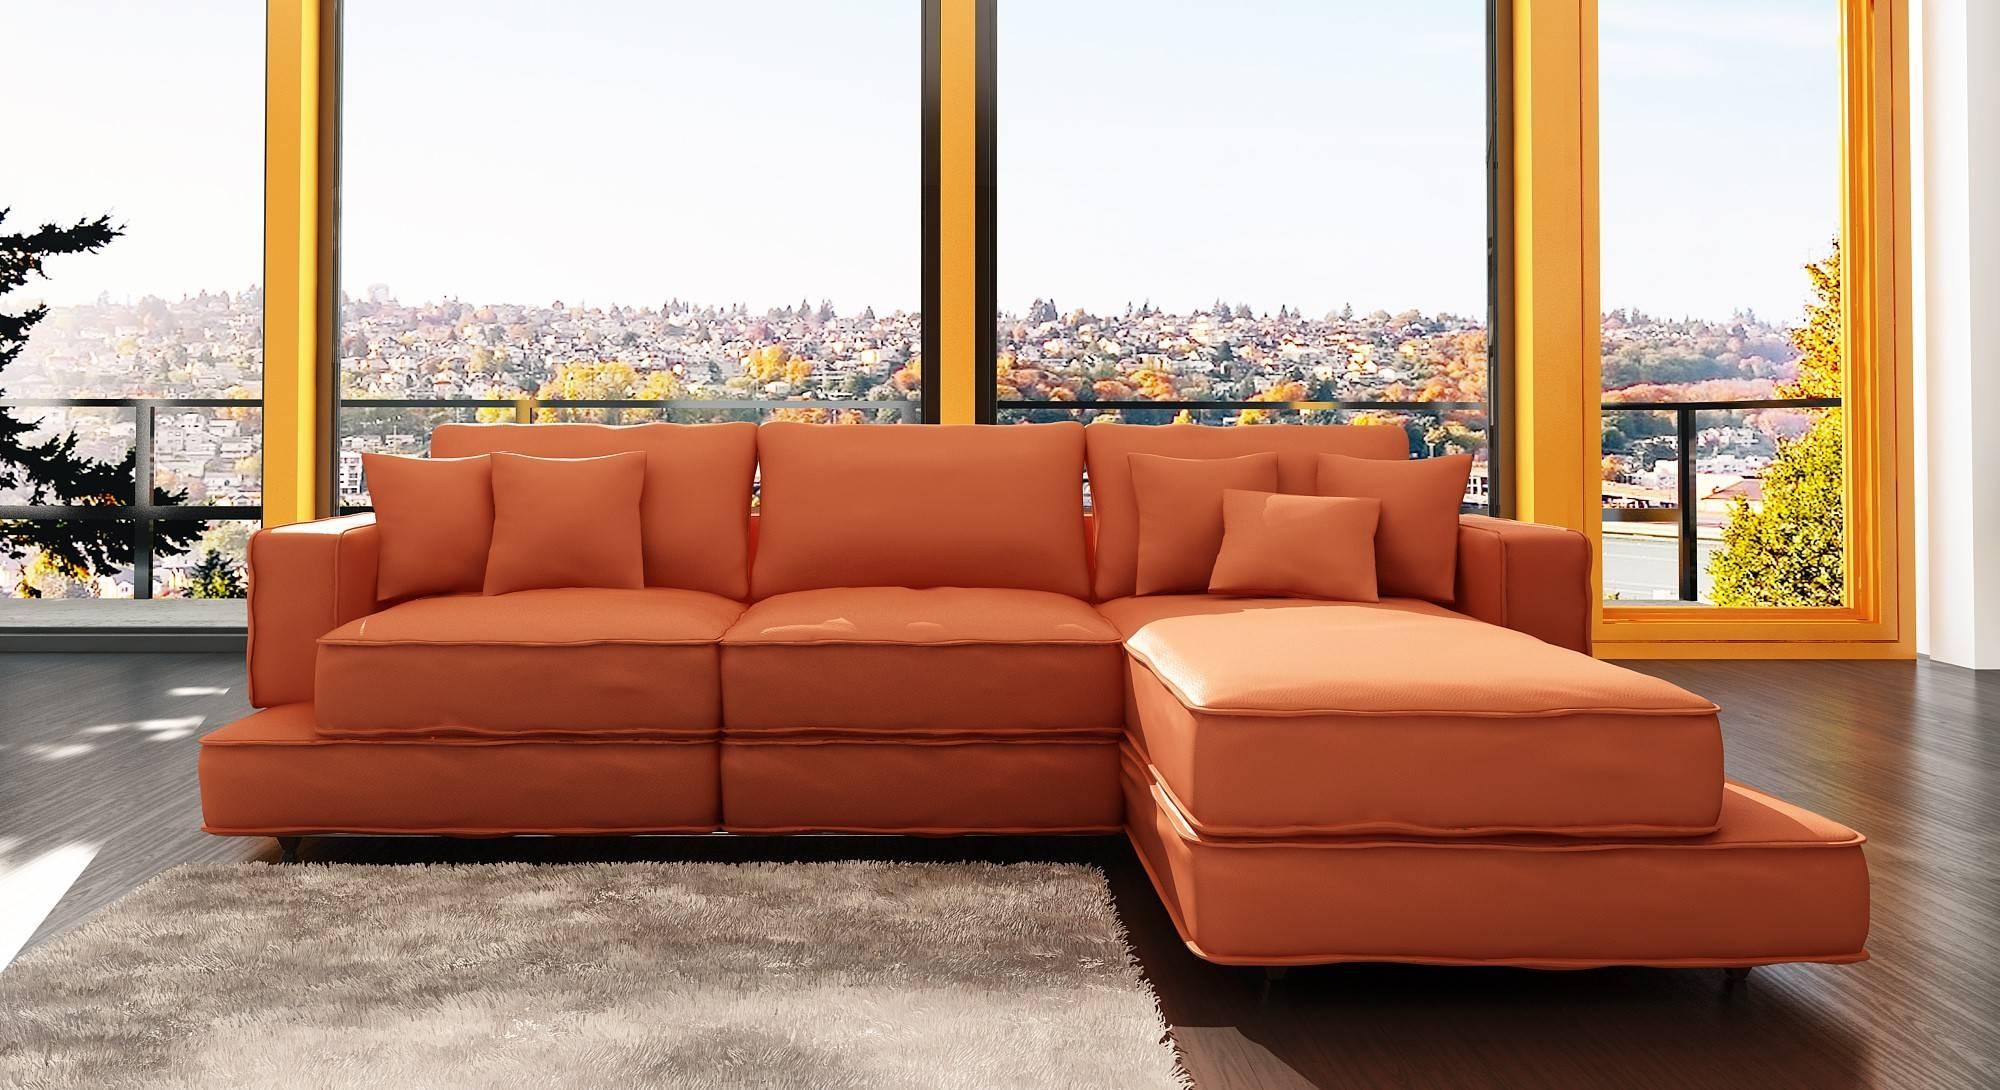 Orange Leather Sofa Bed   Tehranmix Decoration intended for Burnt Orange Leather Sectional Sofas (Image 8 of 15)